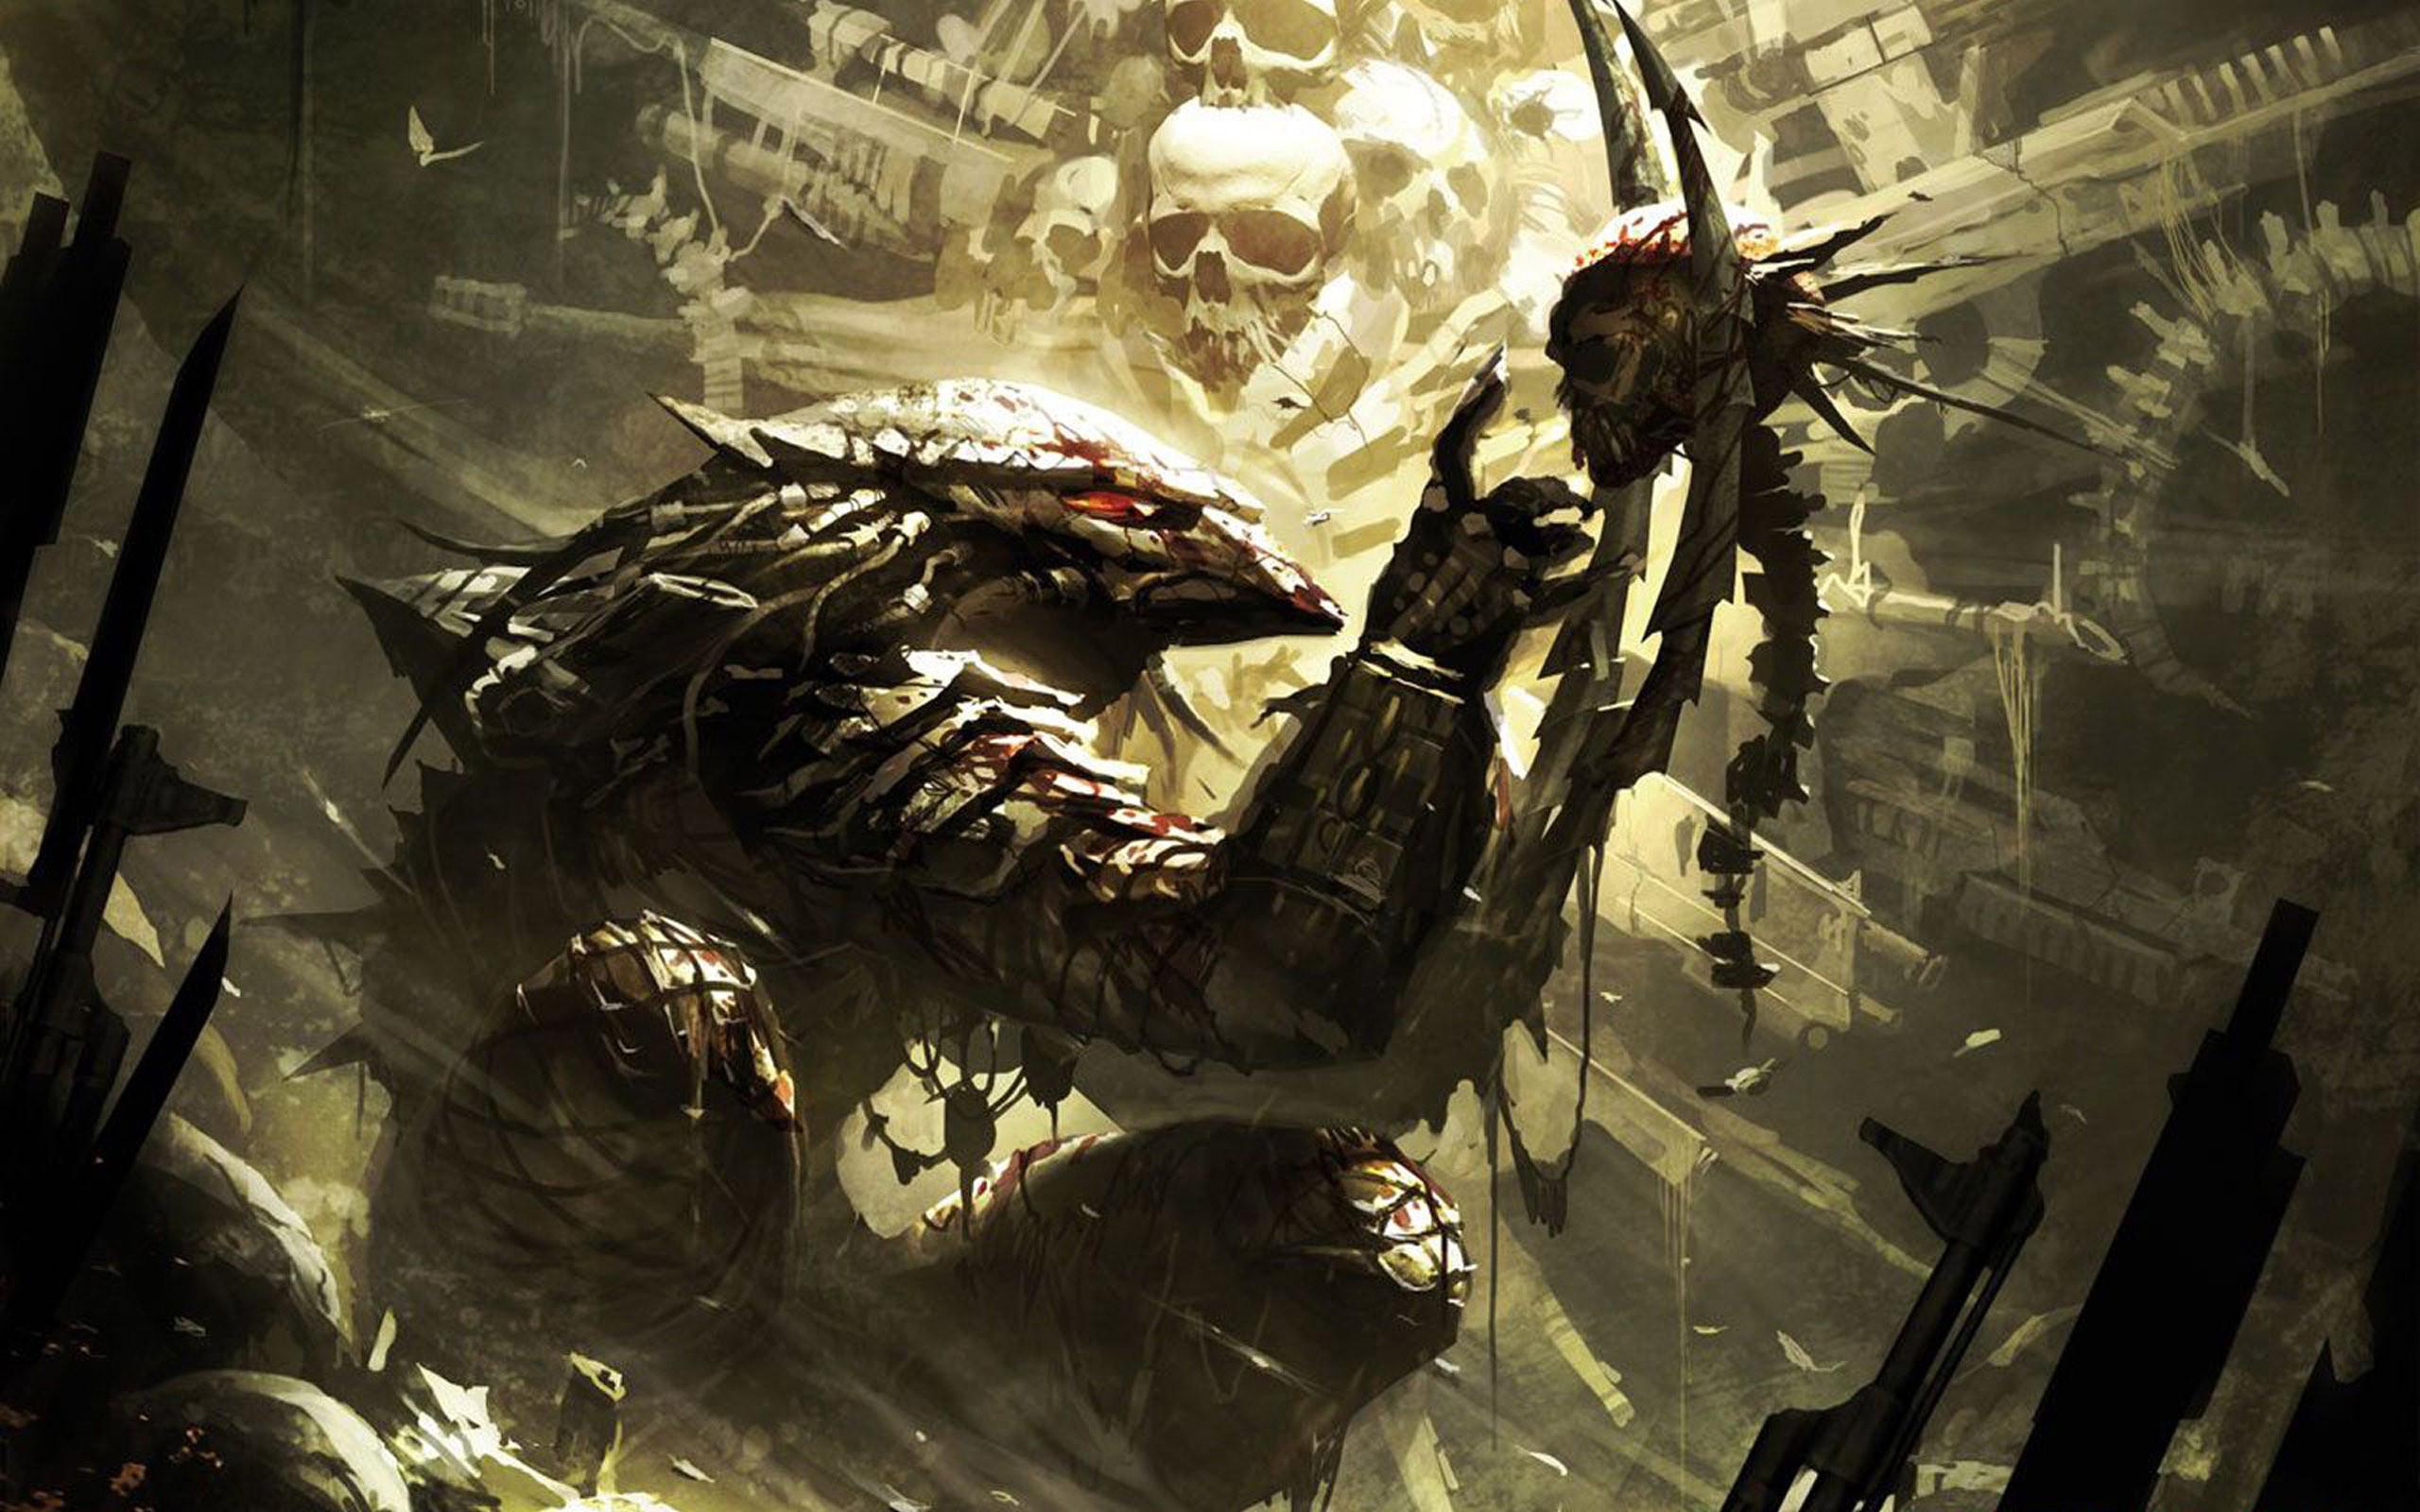 predator-wallpaper-3.jpg (2560×1600)   aliens   Pinterest   Predator, 3d  wallpaper and Wallpaper